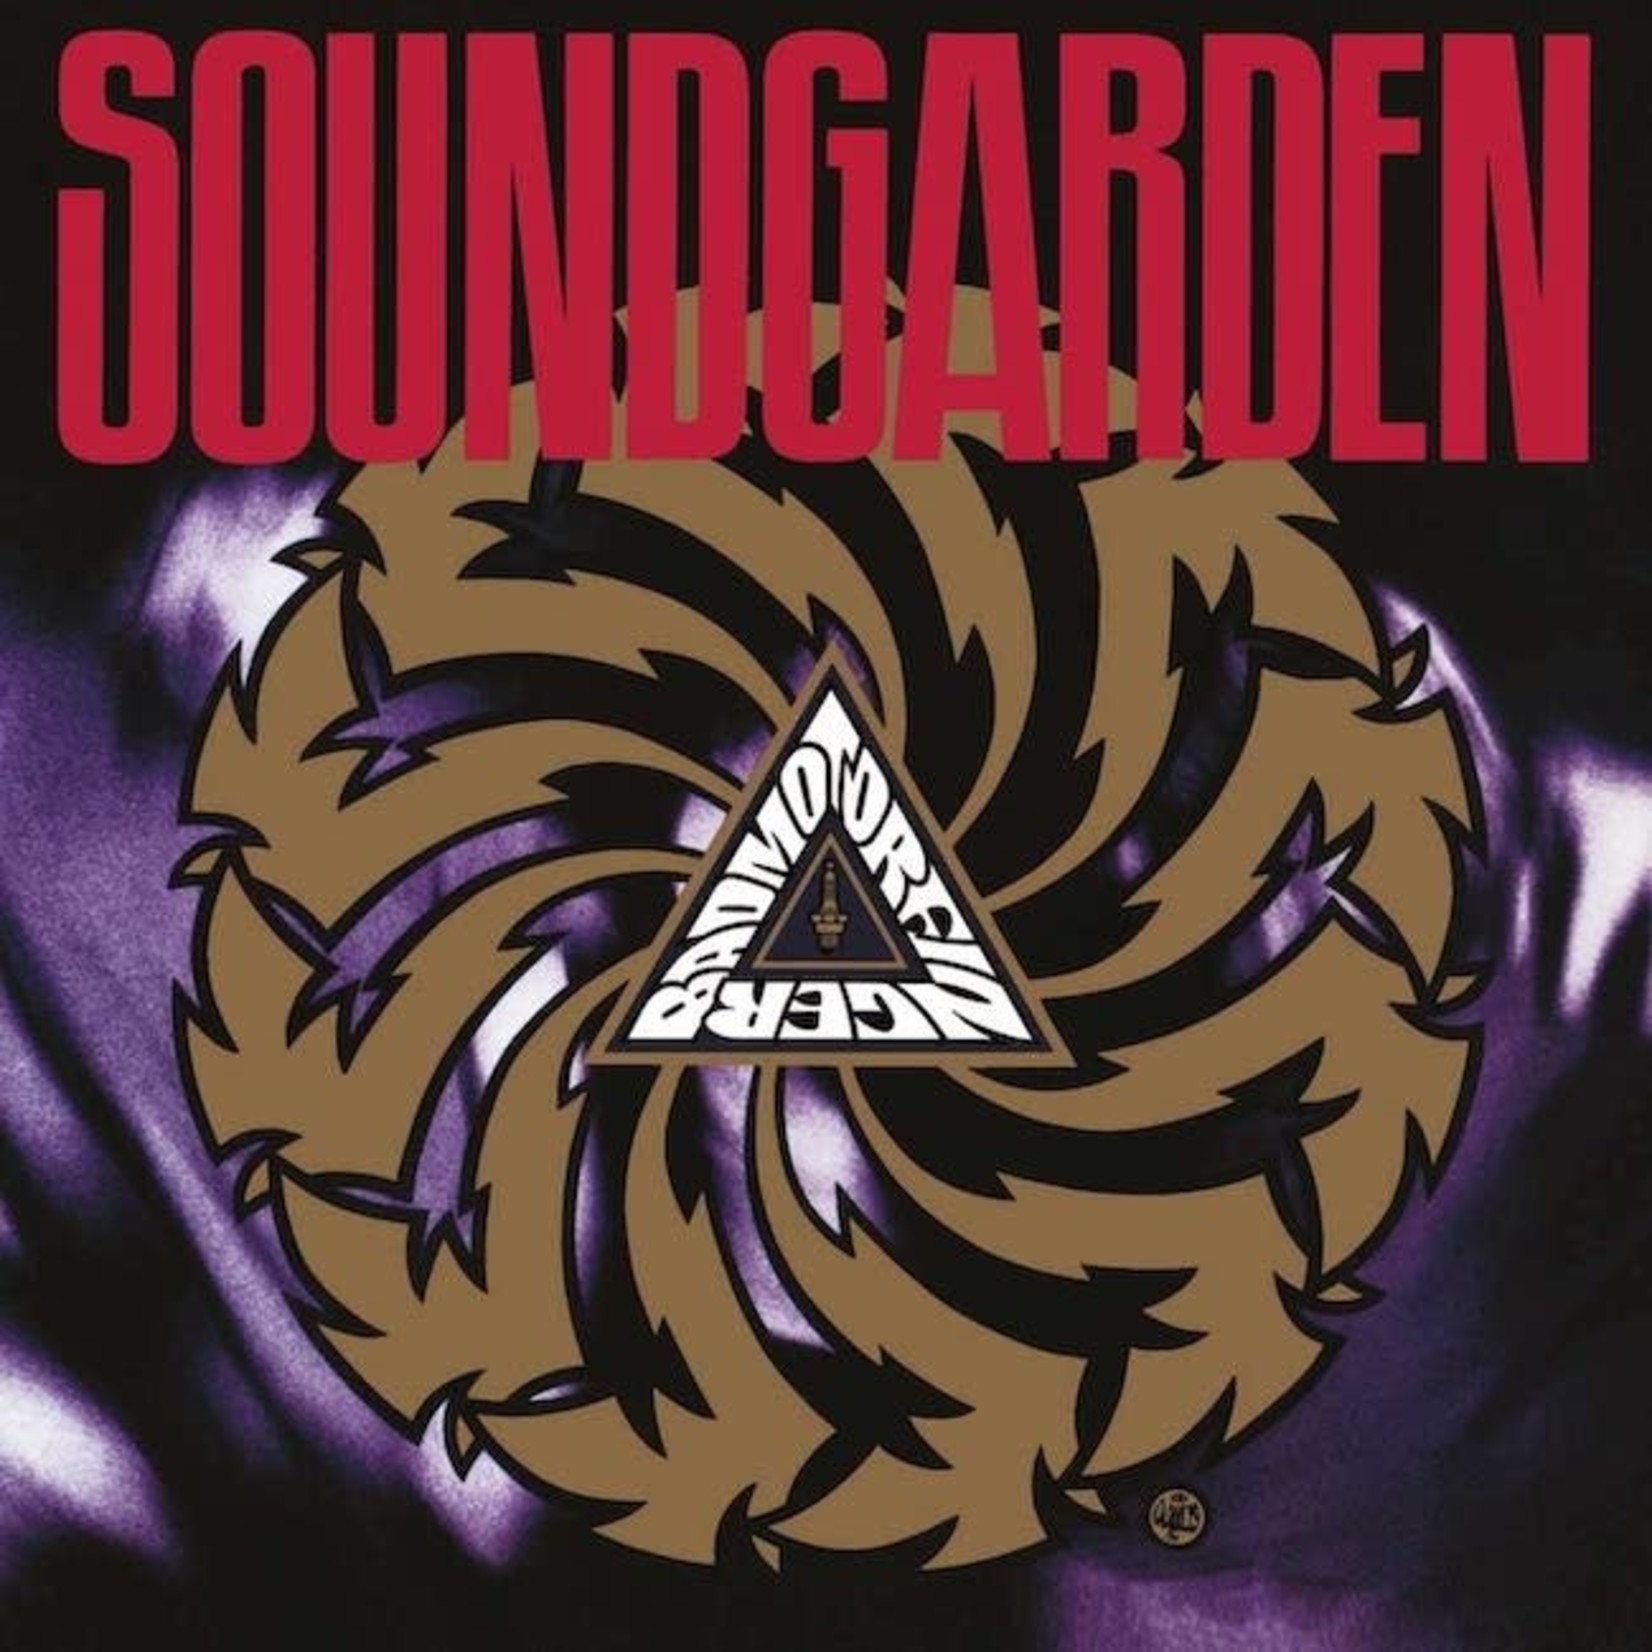 [New] Soundgarden: Badmotorfinger (European Ed.)